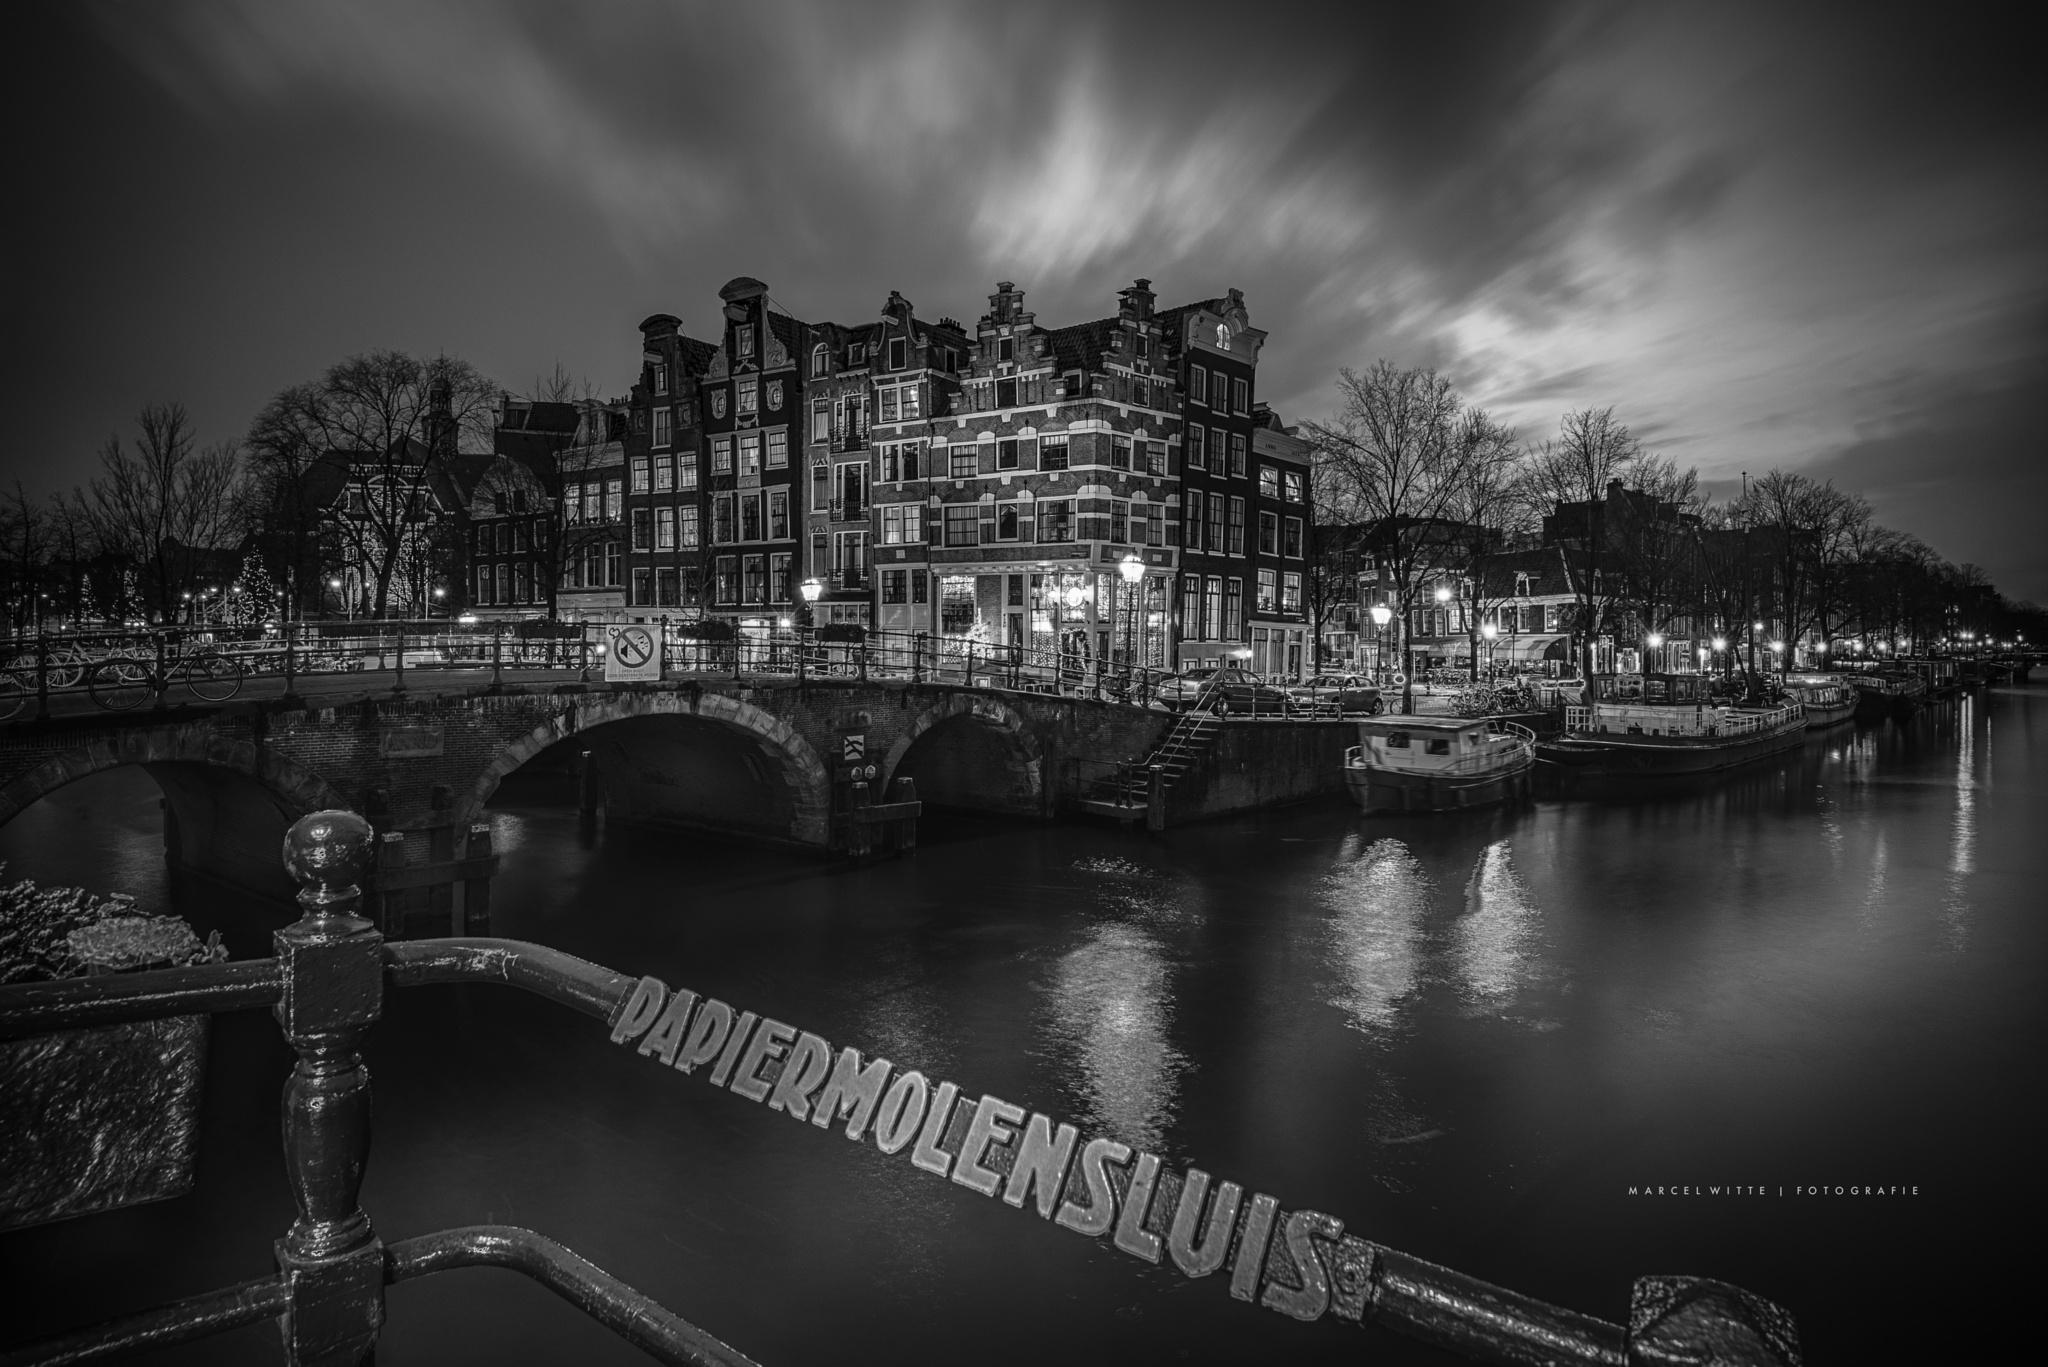 Papiermolensluis by Marcel Witte